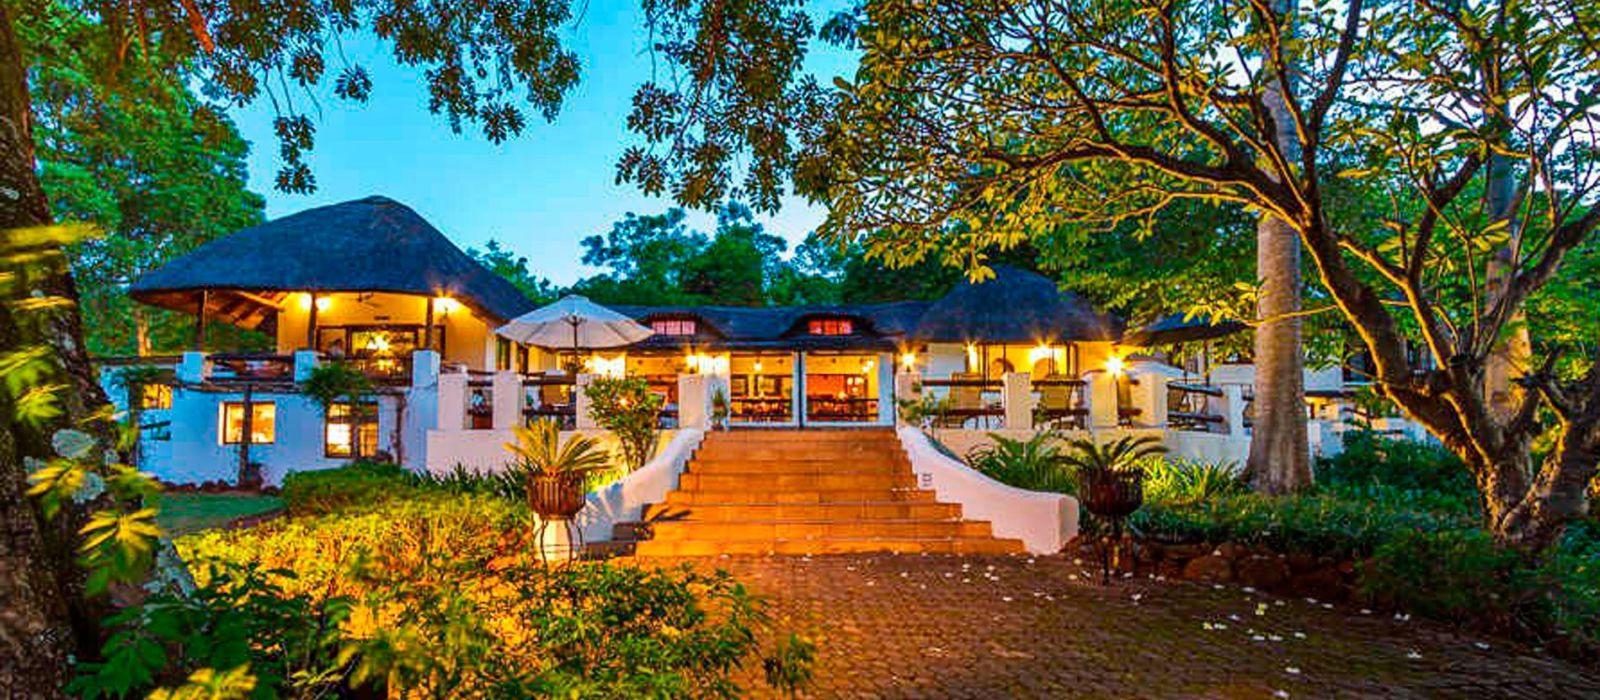 Hotel Rissington Inn South Africa